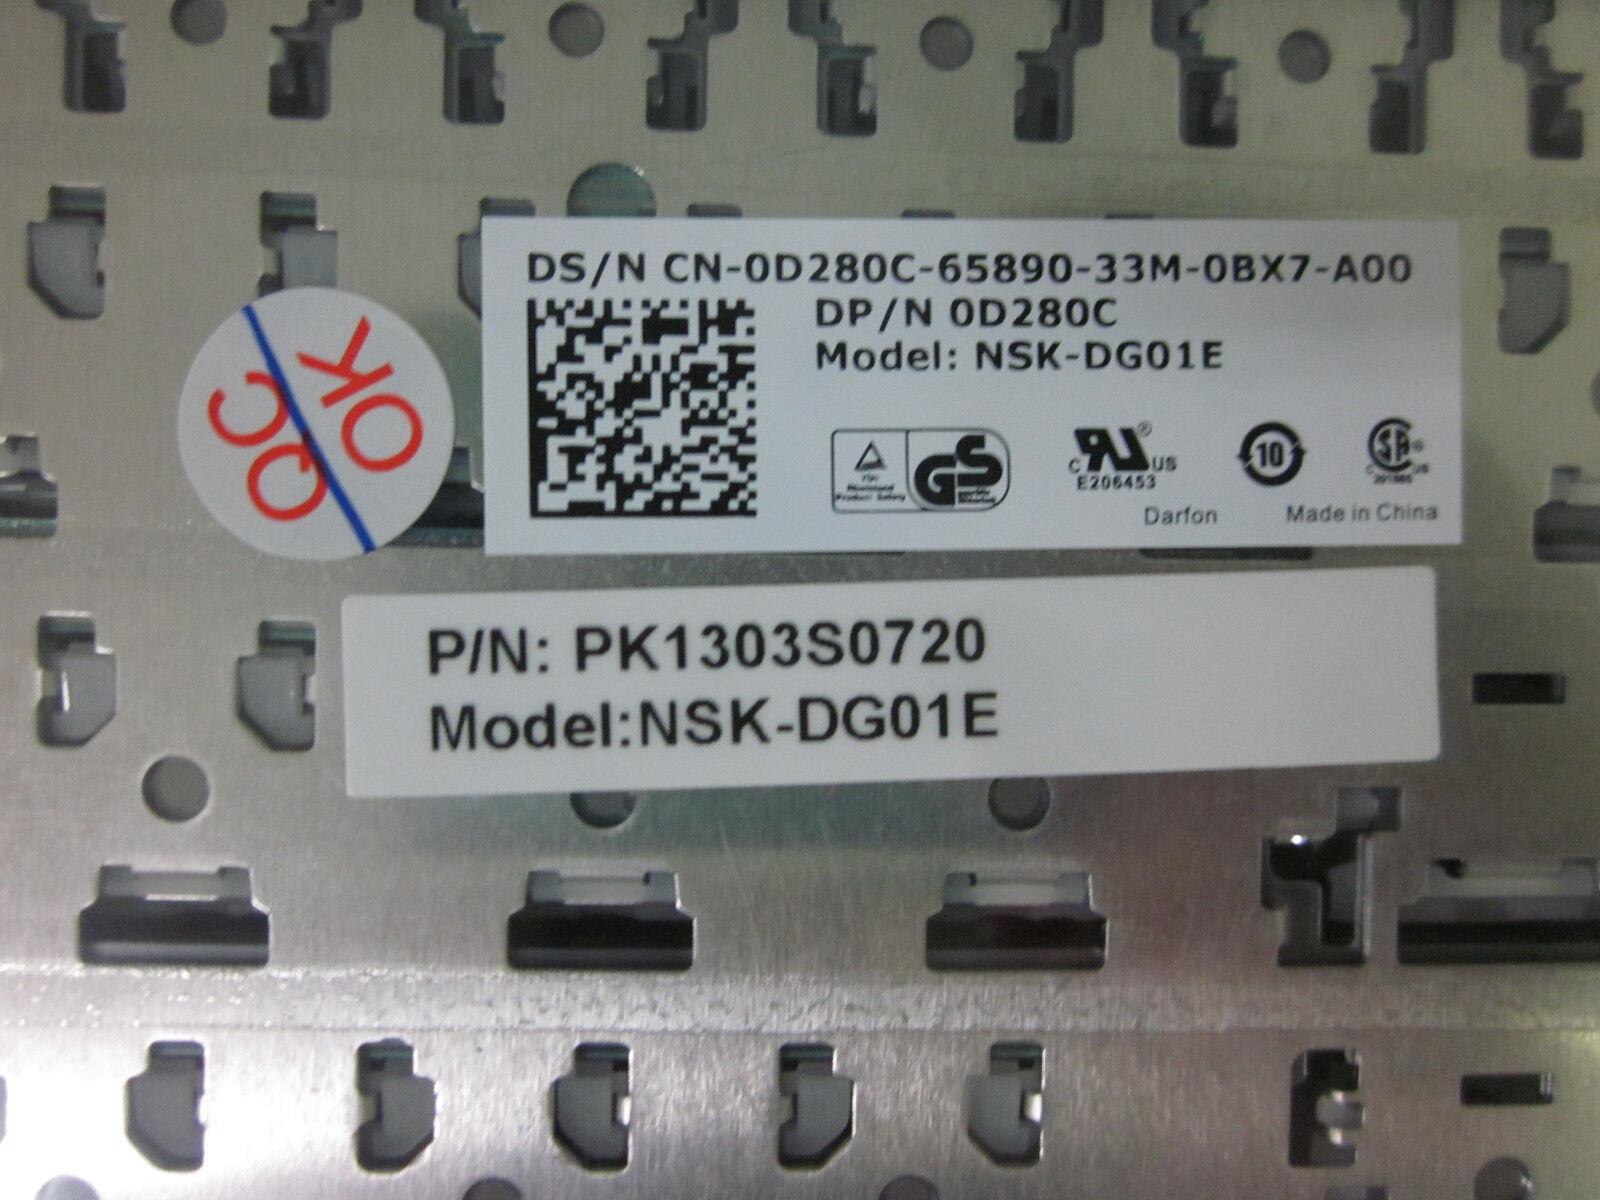 Genuine Dell LATITUDE E4300 SPANISH BLACK KEYBOARD D280C CN-0D280C